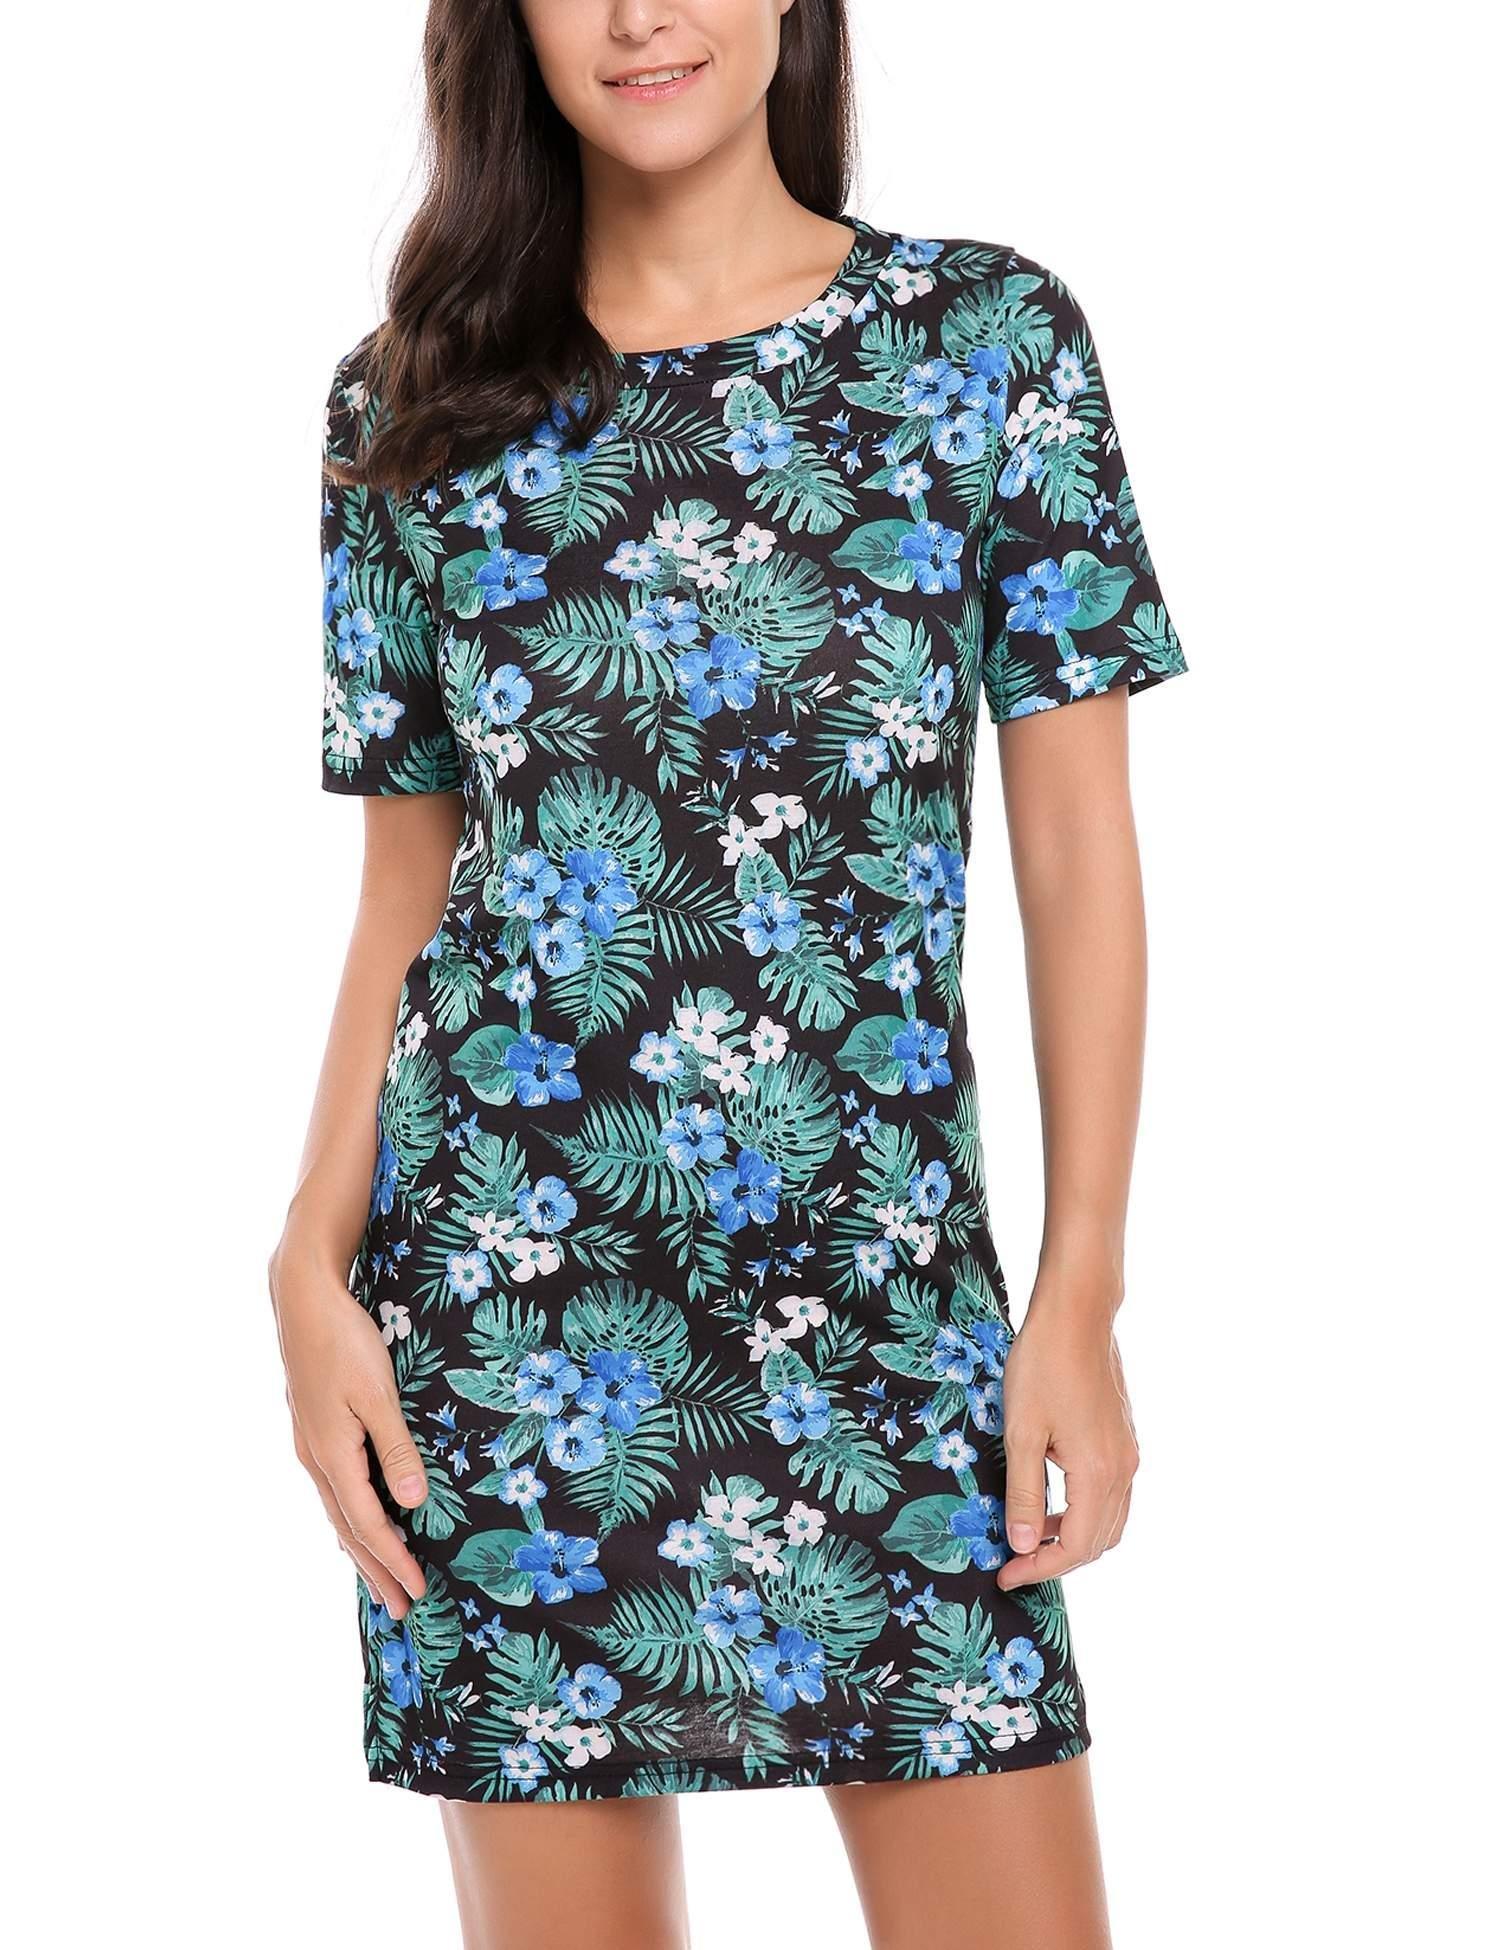 Zeagoo Women's Floral Printed Short Sleeve Summer Casual T-Shirt Mini Dresses (Blue,XL)